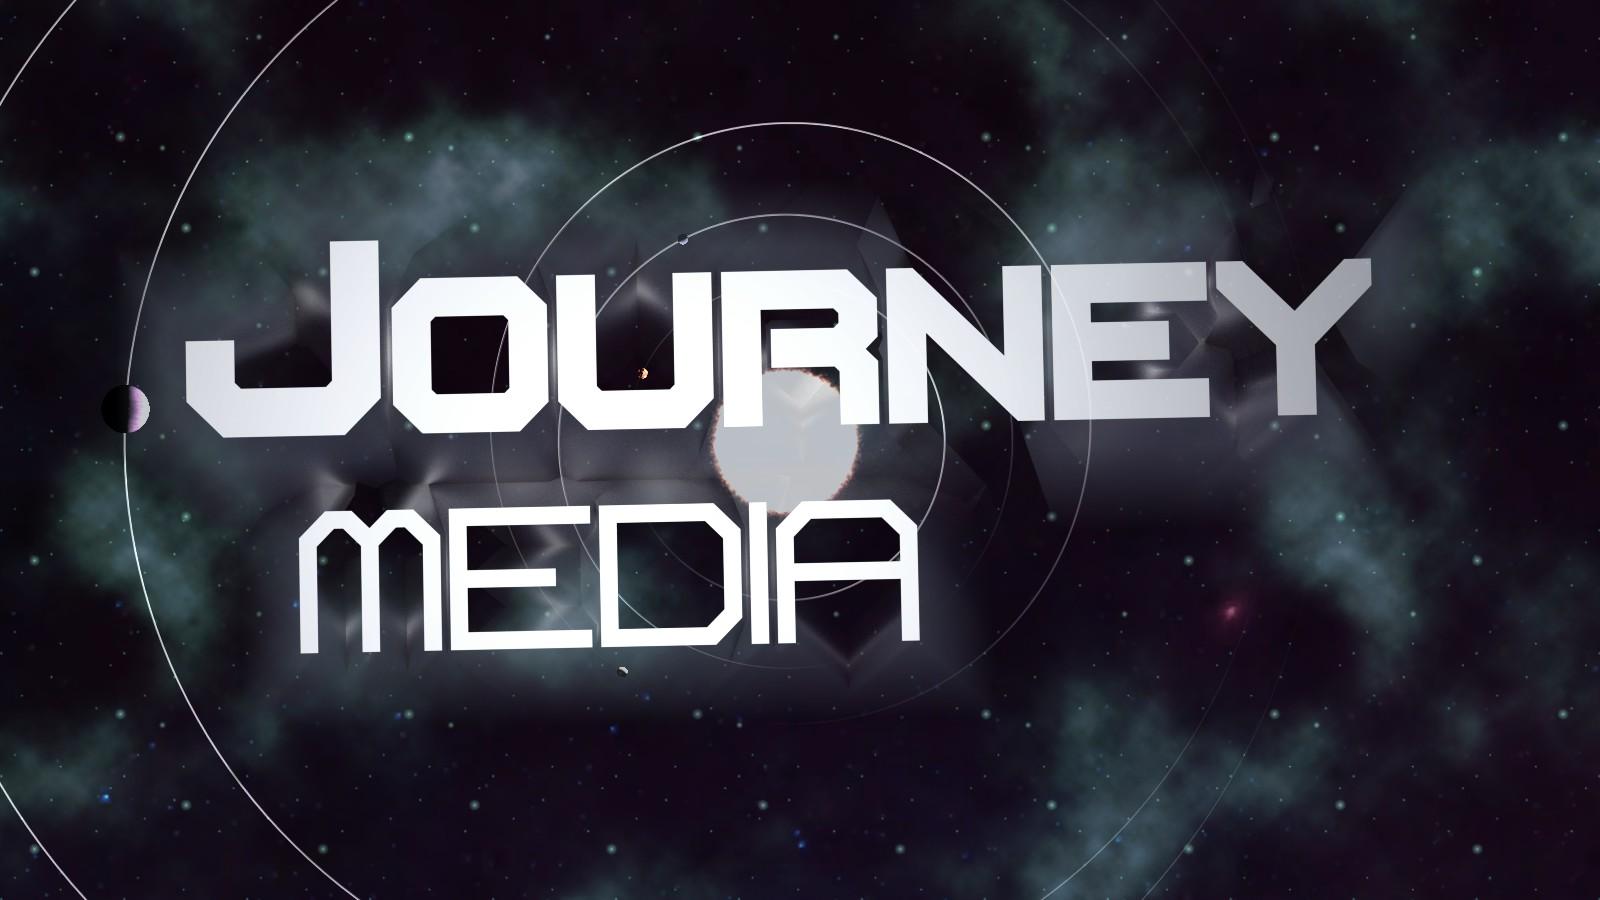 Beyond Journey